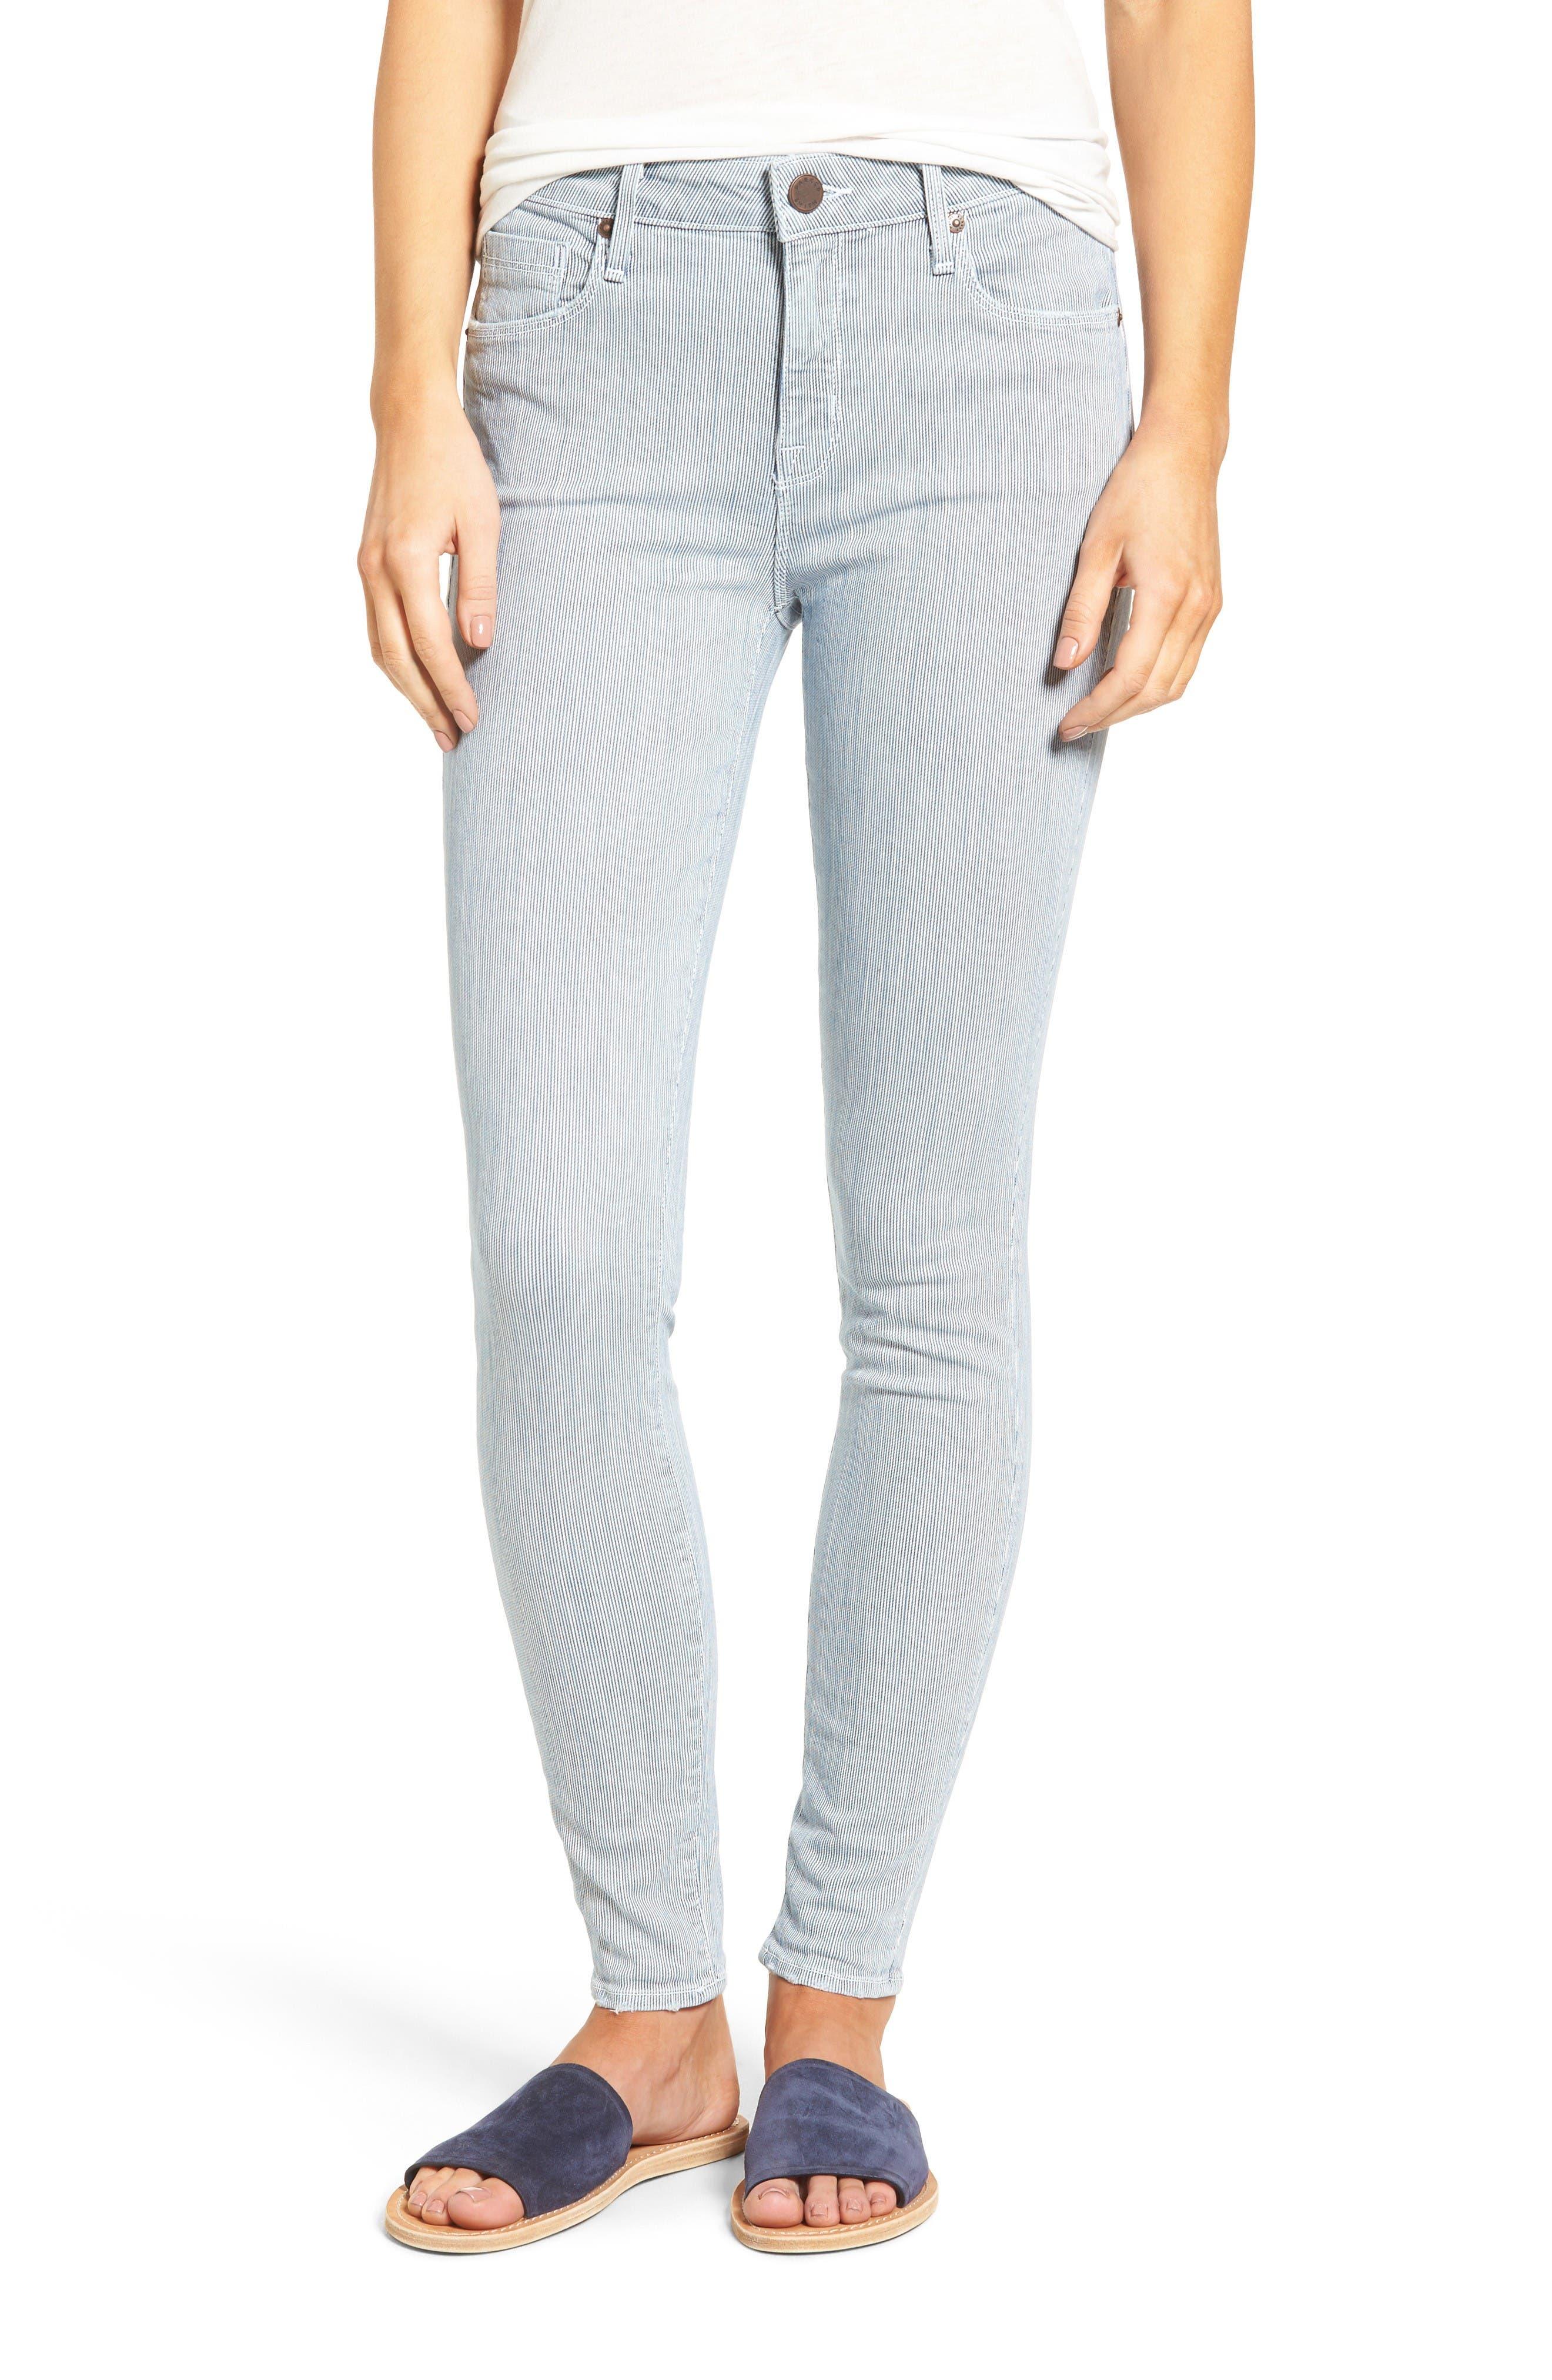 Alternate Image 1 Selected - PARKER SMITH Ava Railroad Stripe Skinny Jeans (Engineer)